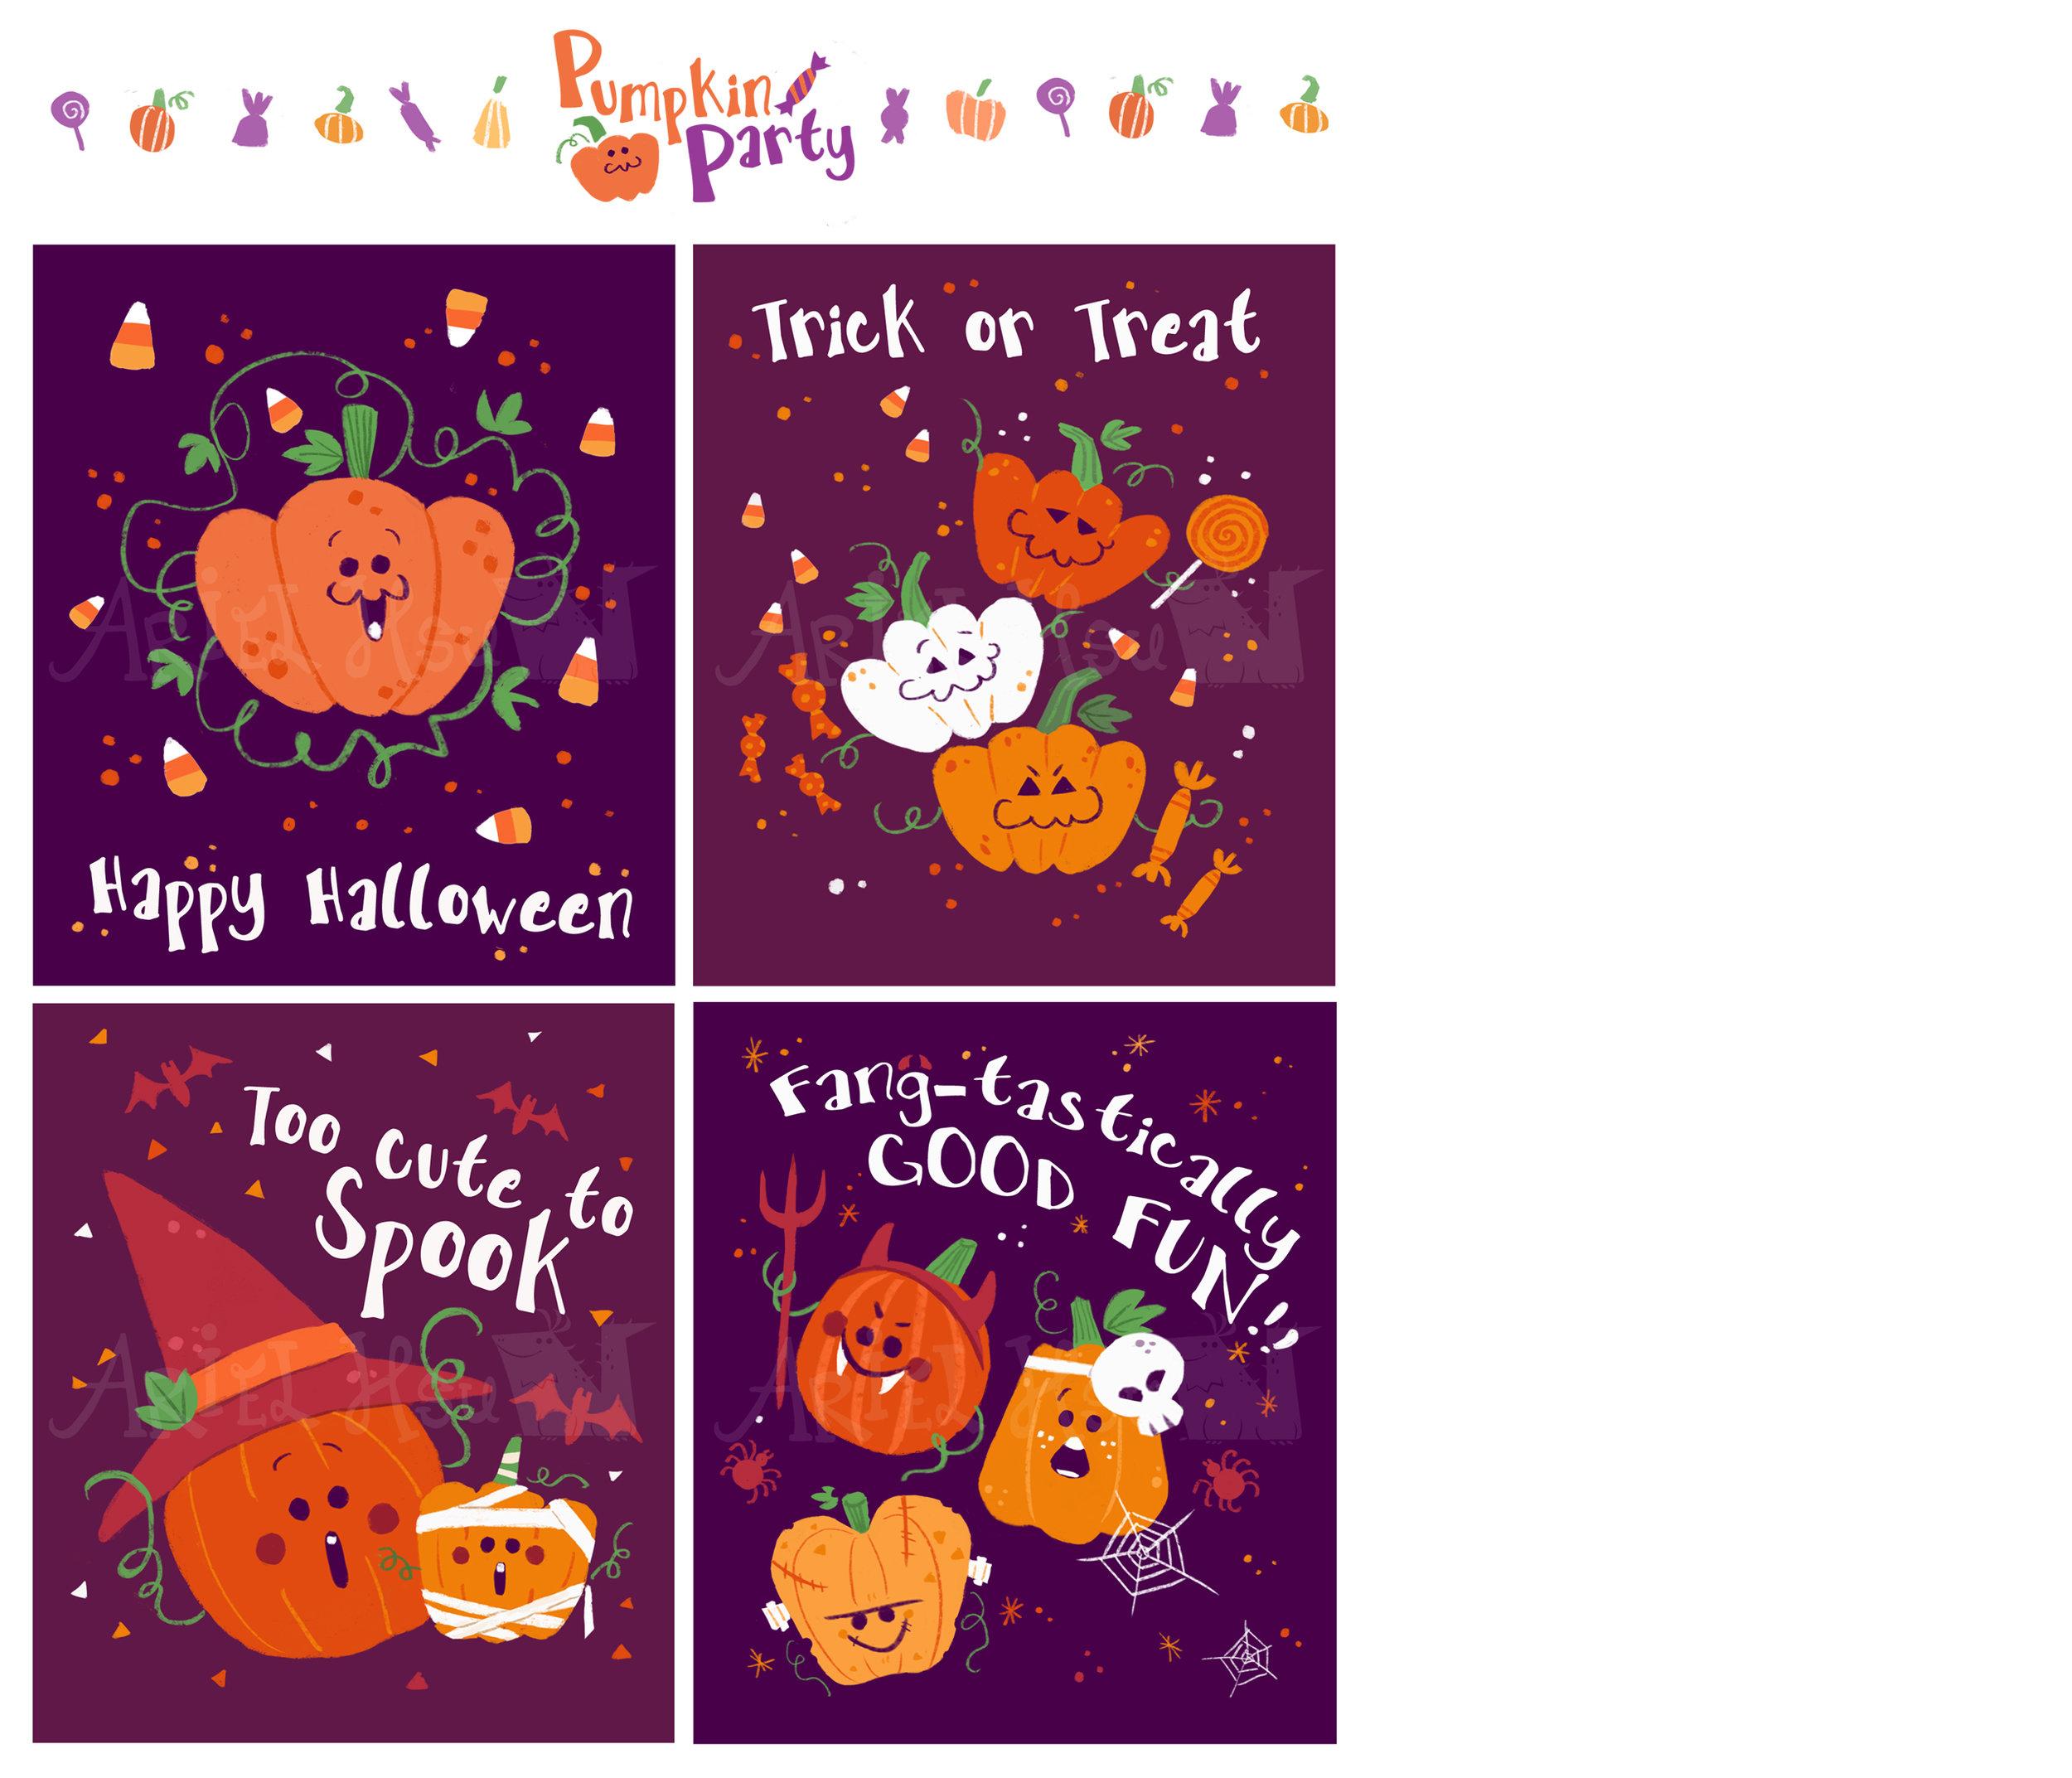 02_Pumpkin Party ill.jpg